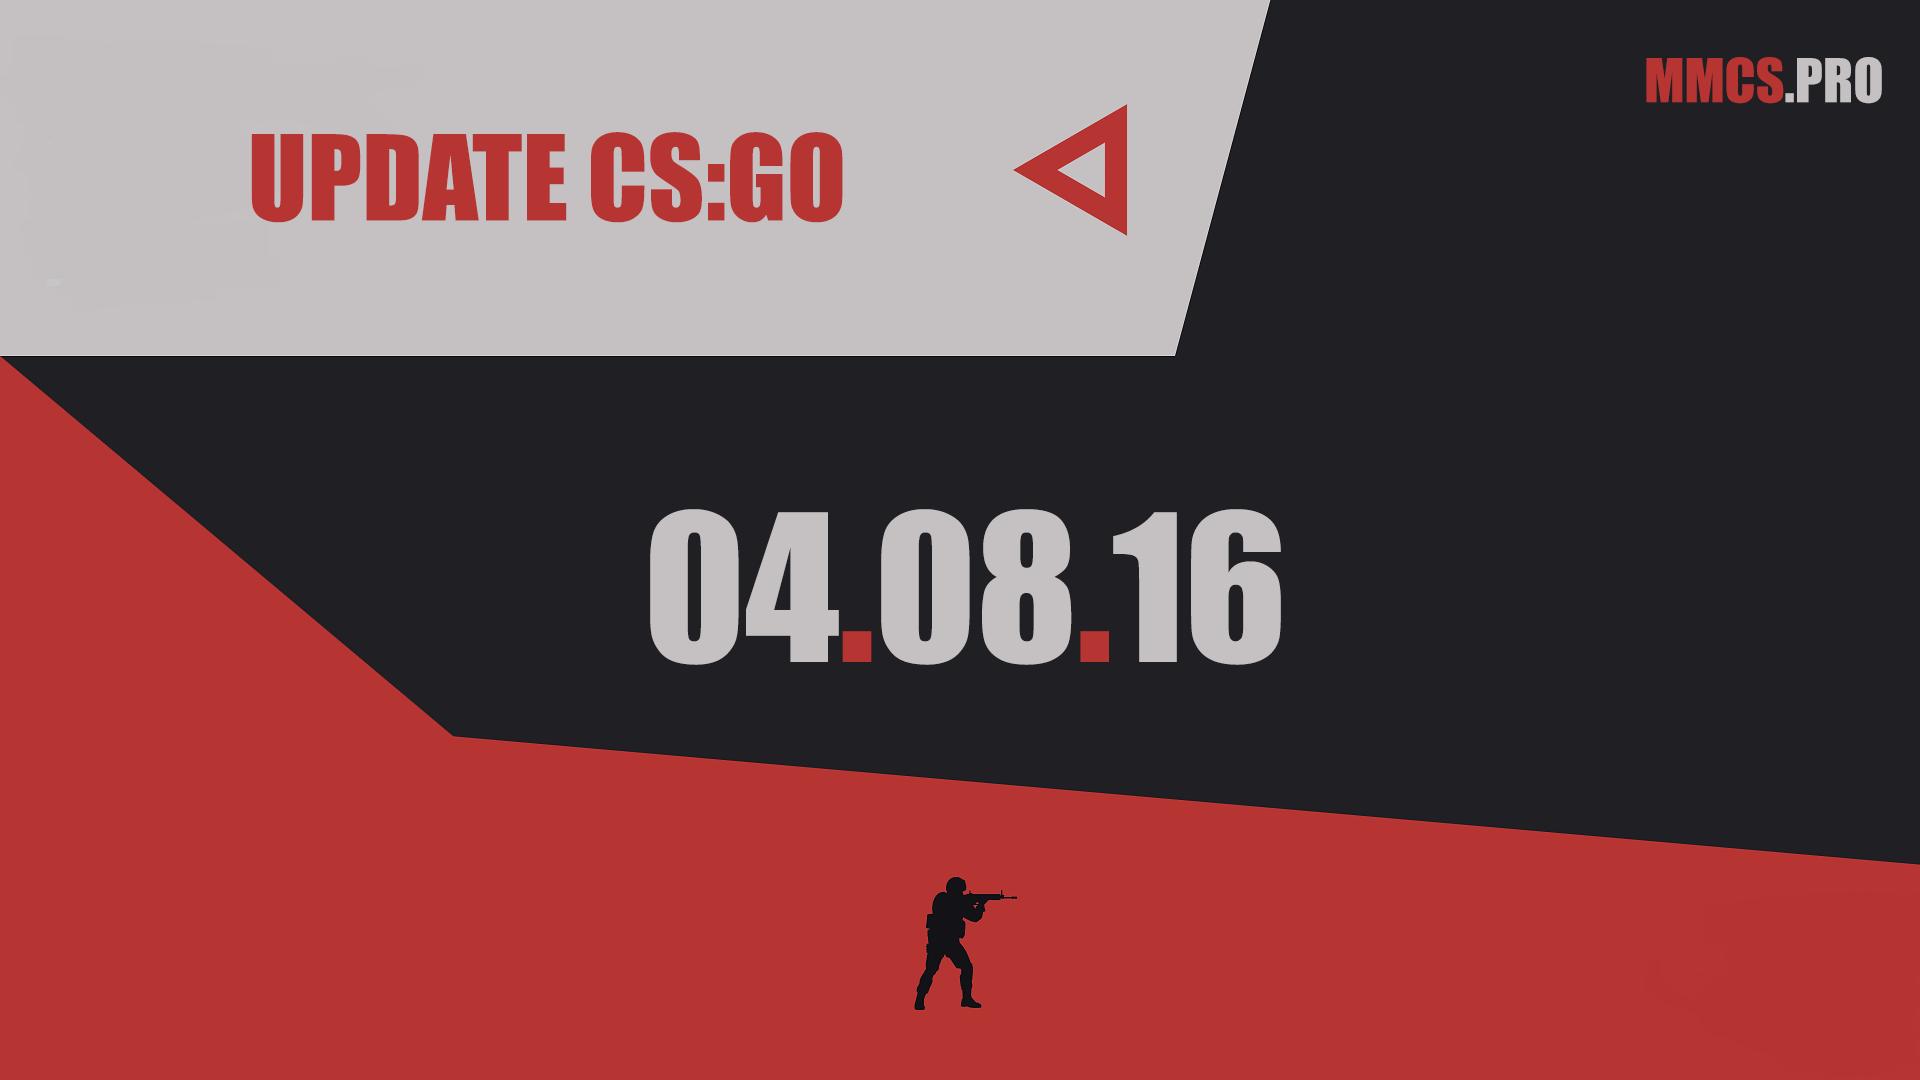 https://mmcs.pro/update-csgo-04-08-2016-valve/